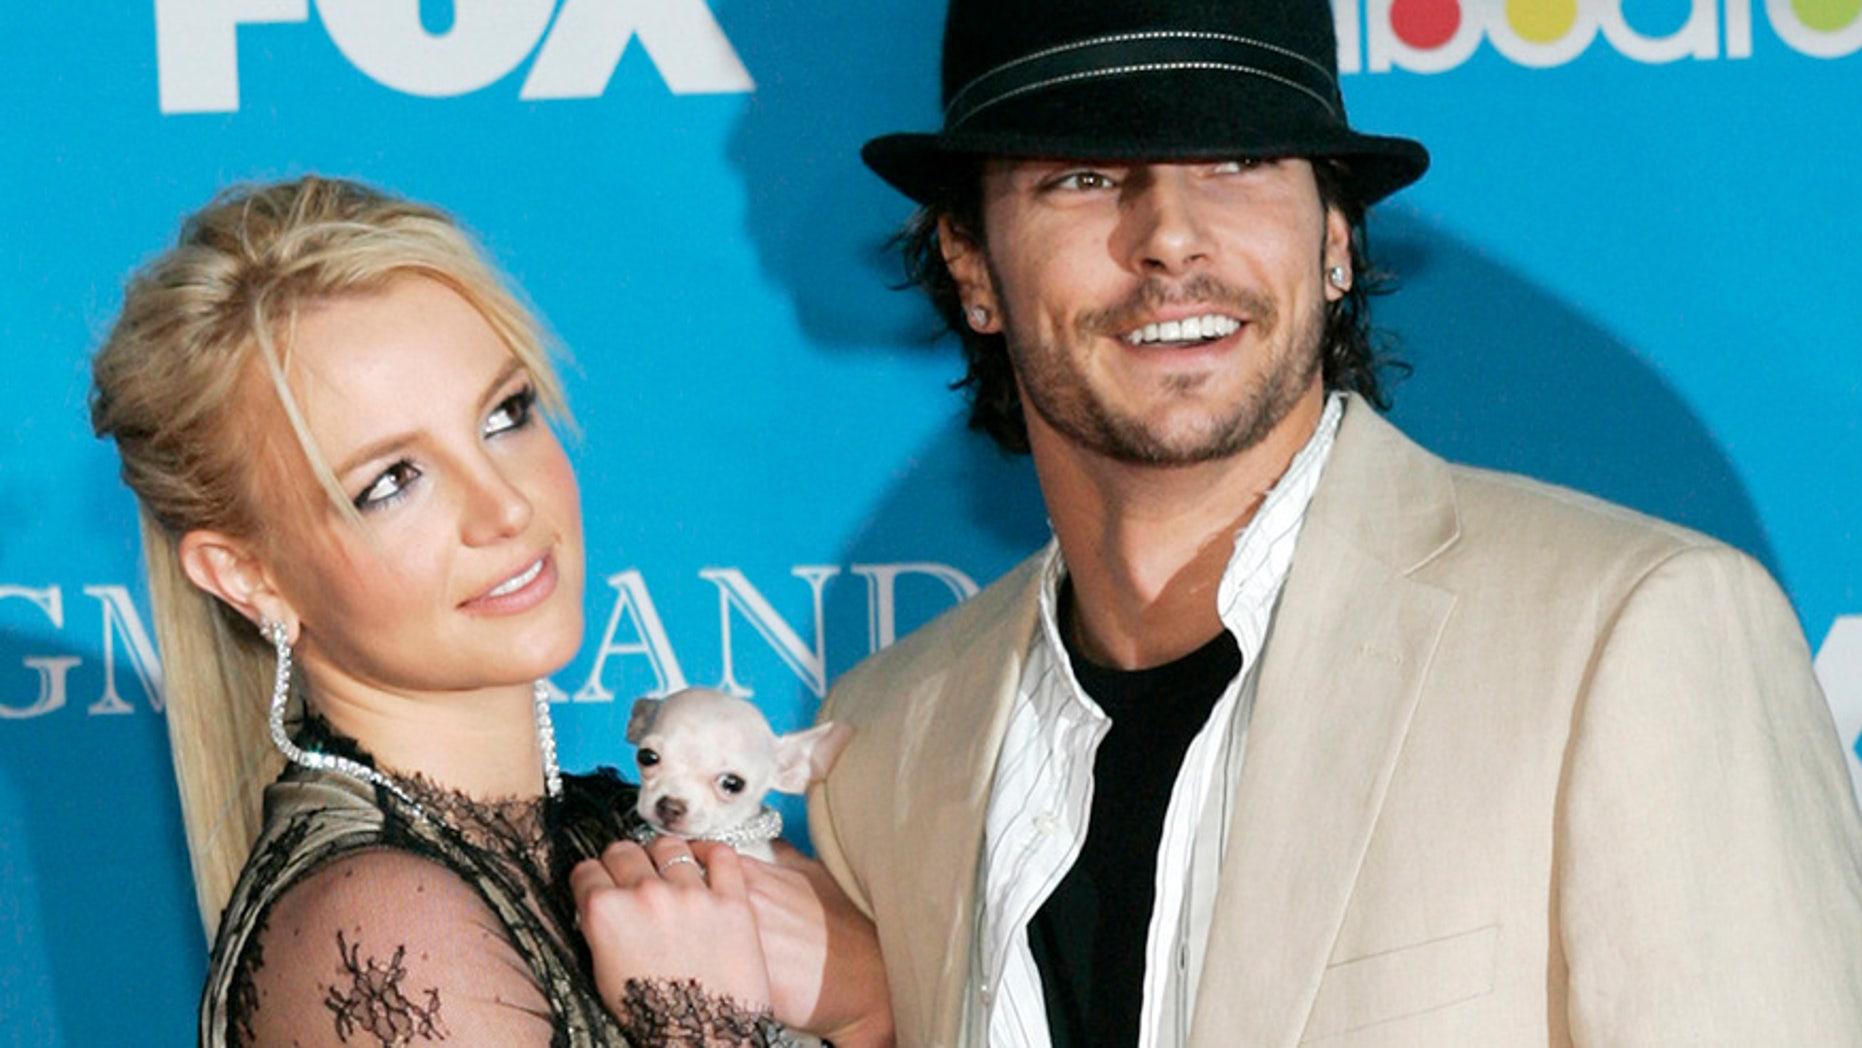 Britney Spears and Kevin Federline arrive for the 2004 Billboard Music Awards in Las Vegas.